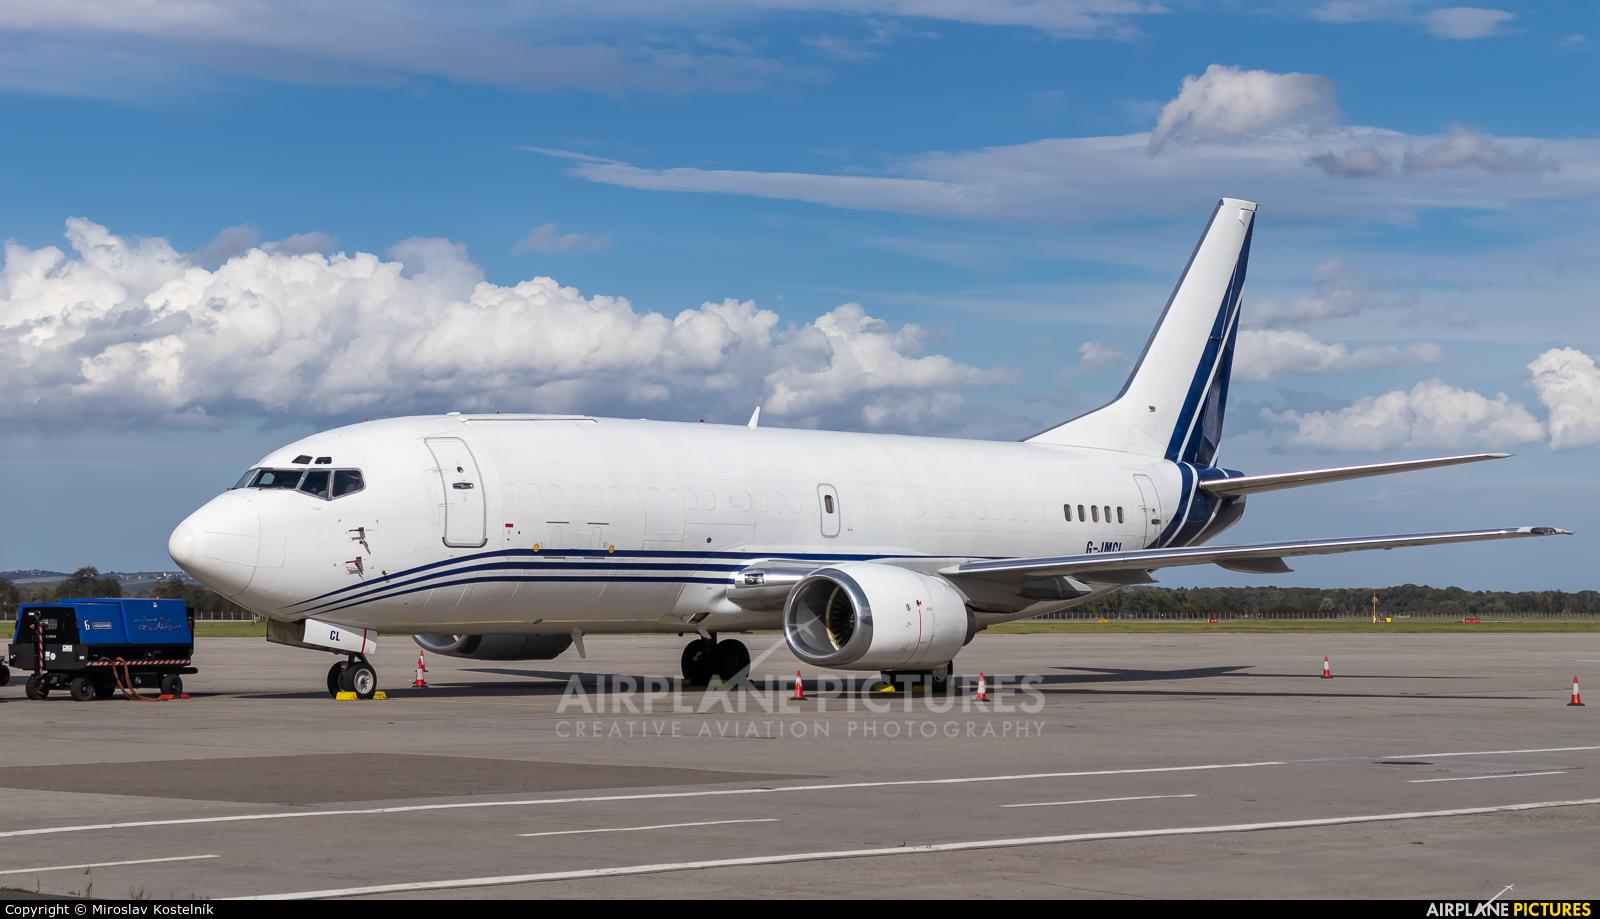 Atlantic Airlines G-JMCL aircraft at Ostrava Mošnov